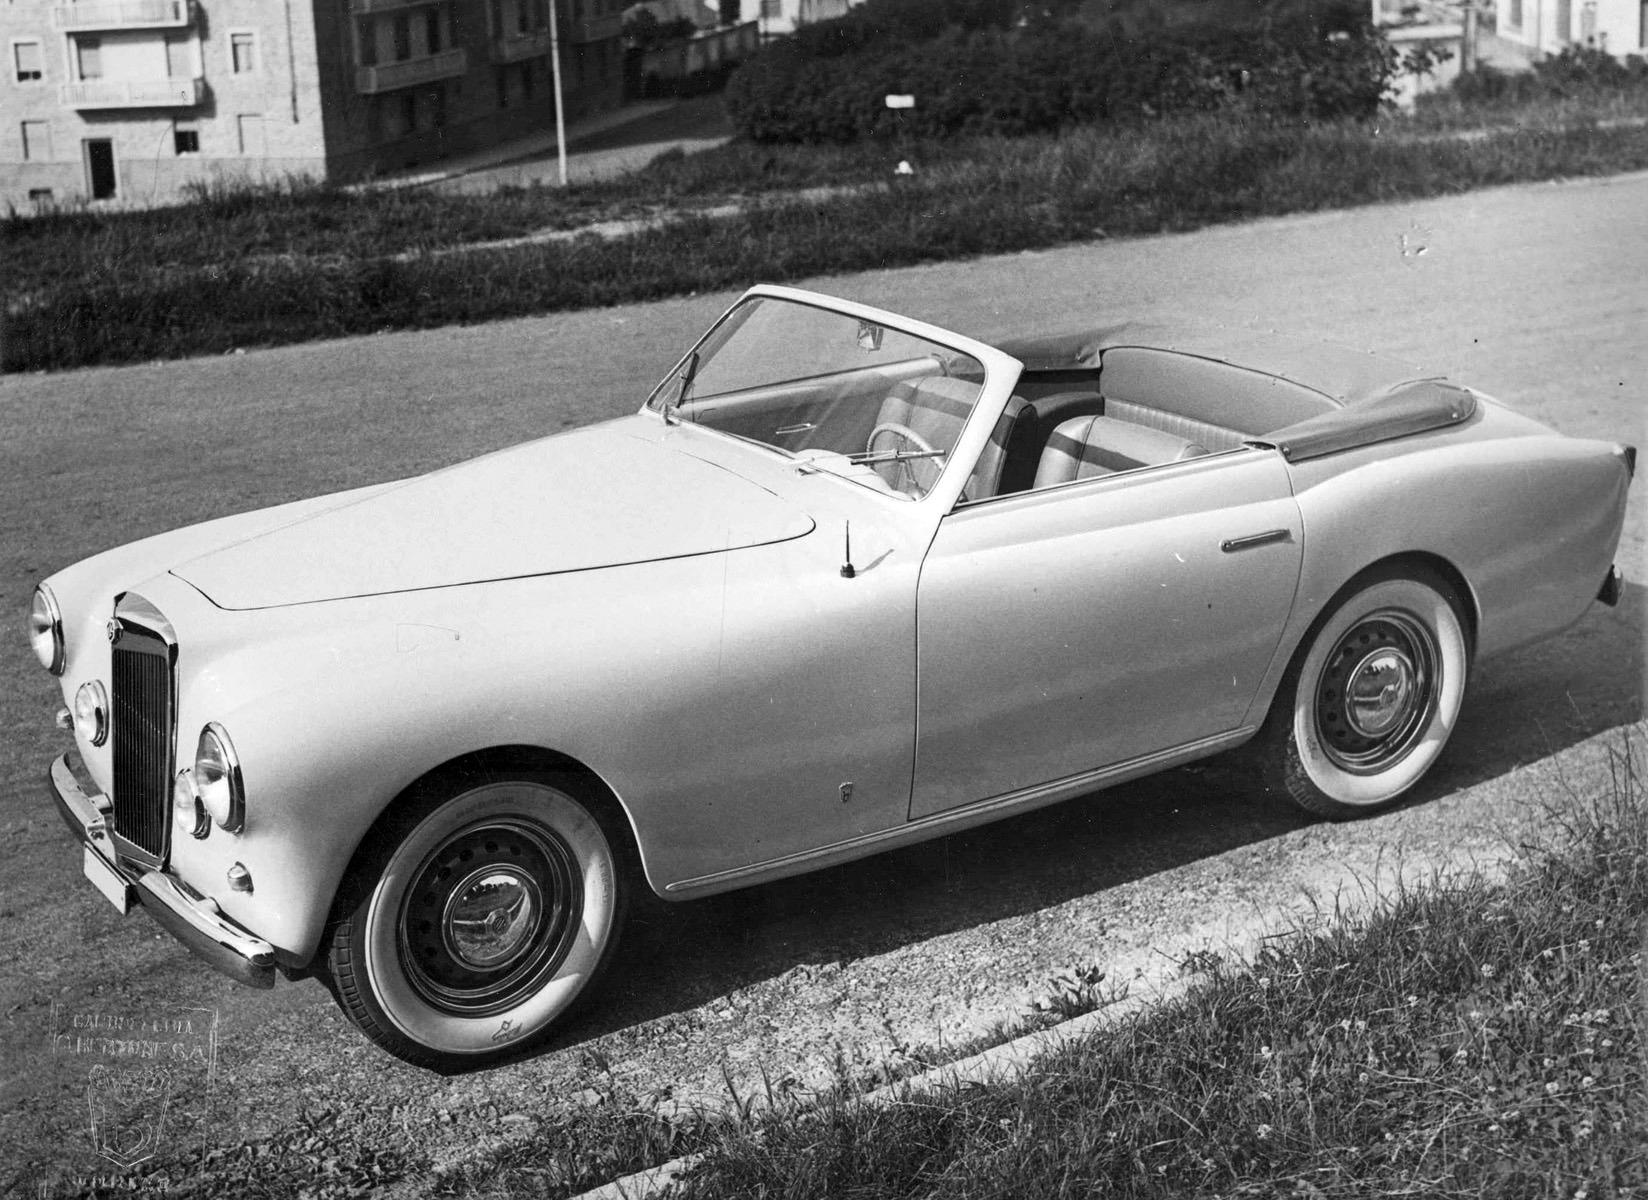 Bertone-100-Years-1950s-1952-MG-TD-Cabriolet-1920x1200